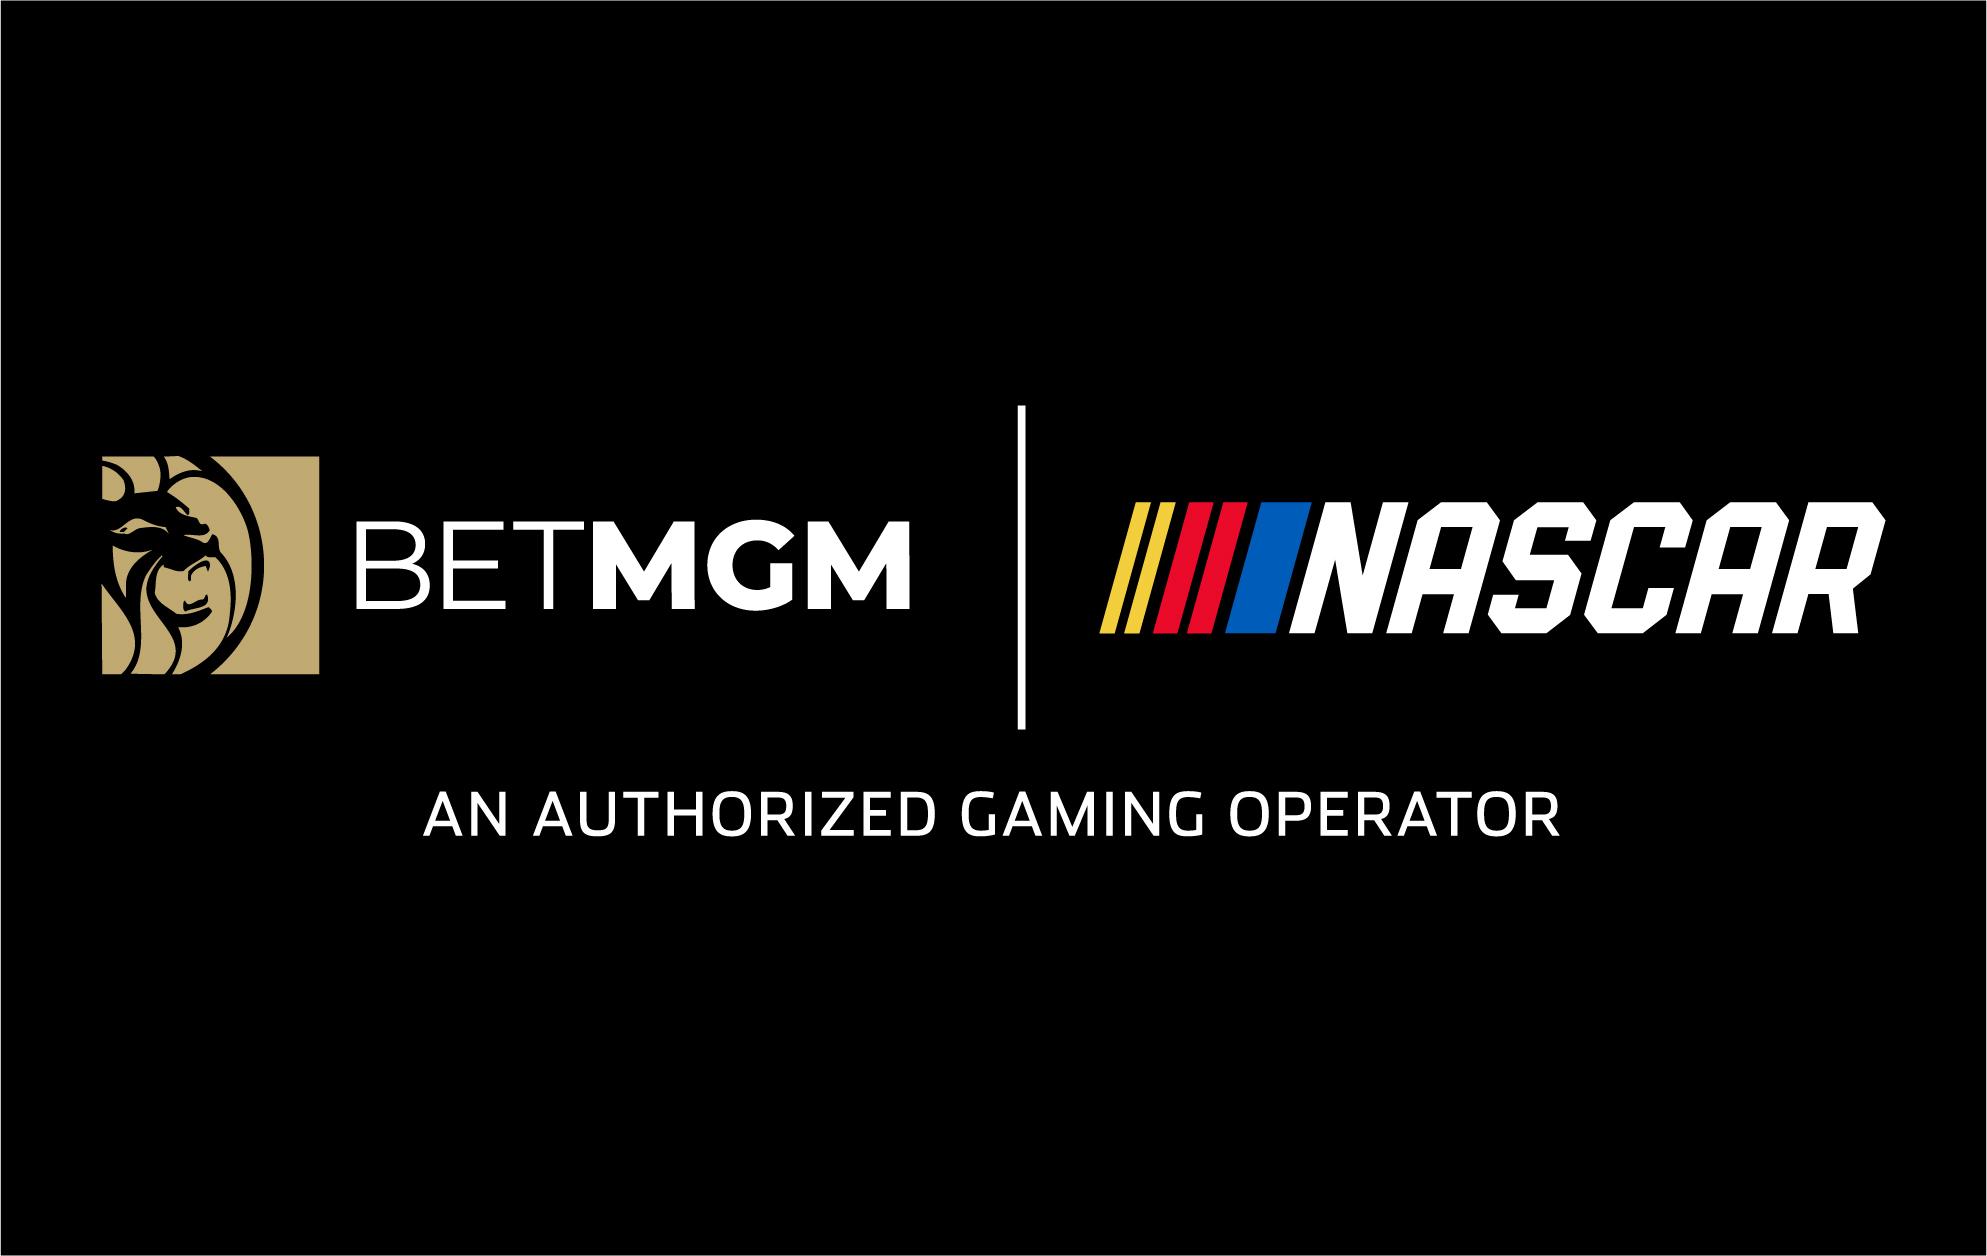 BetMGM logo next to Nascar logo